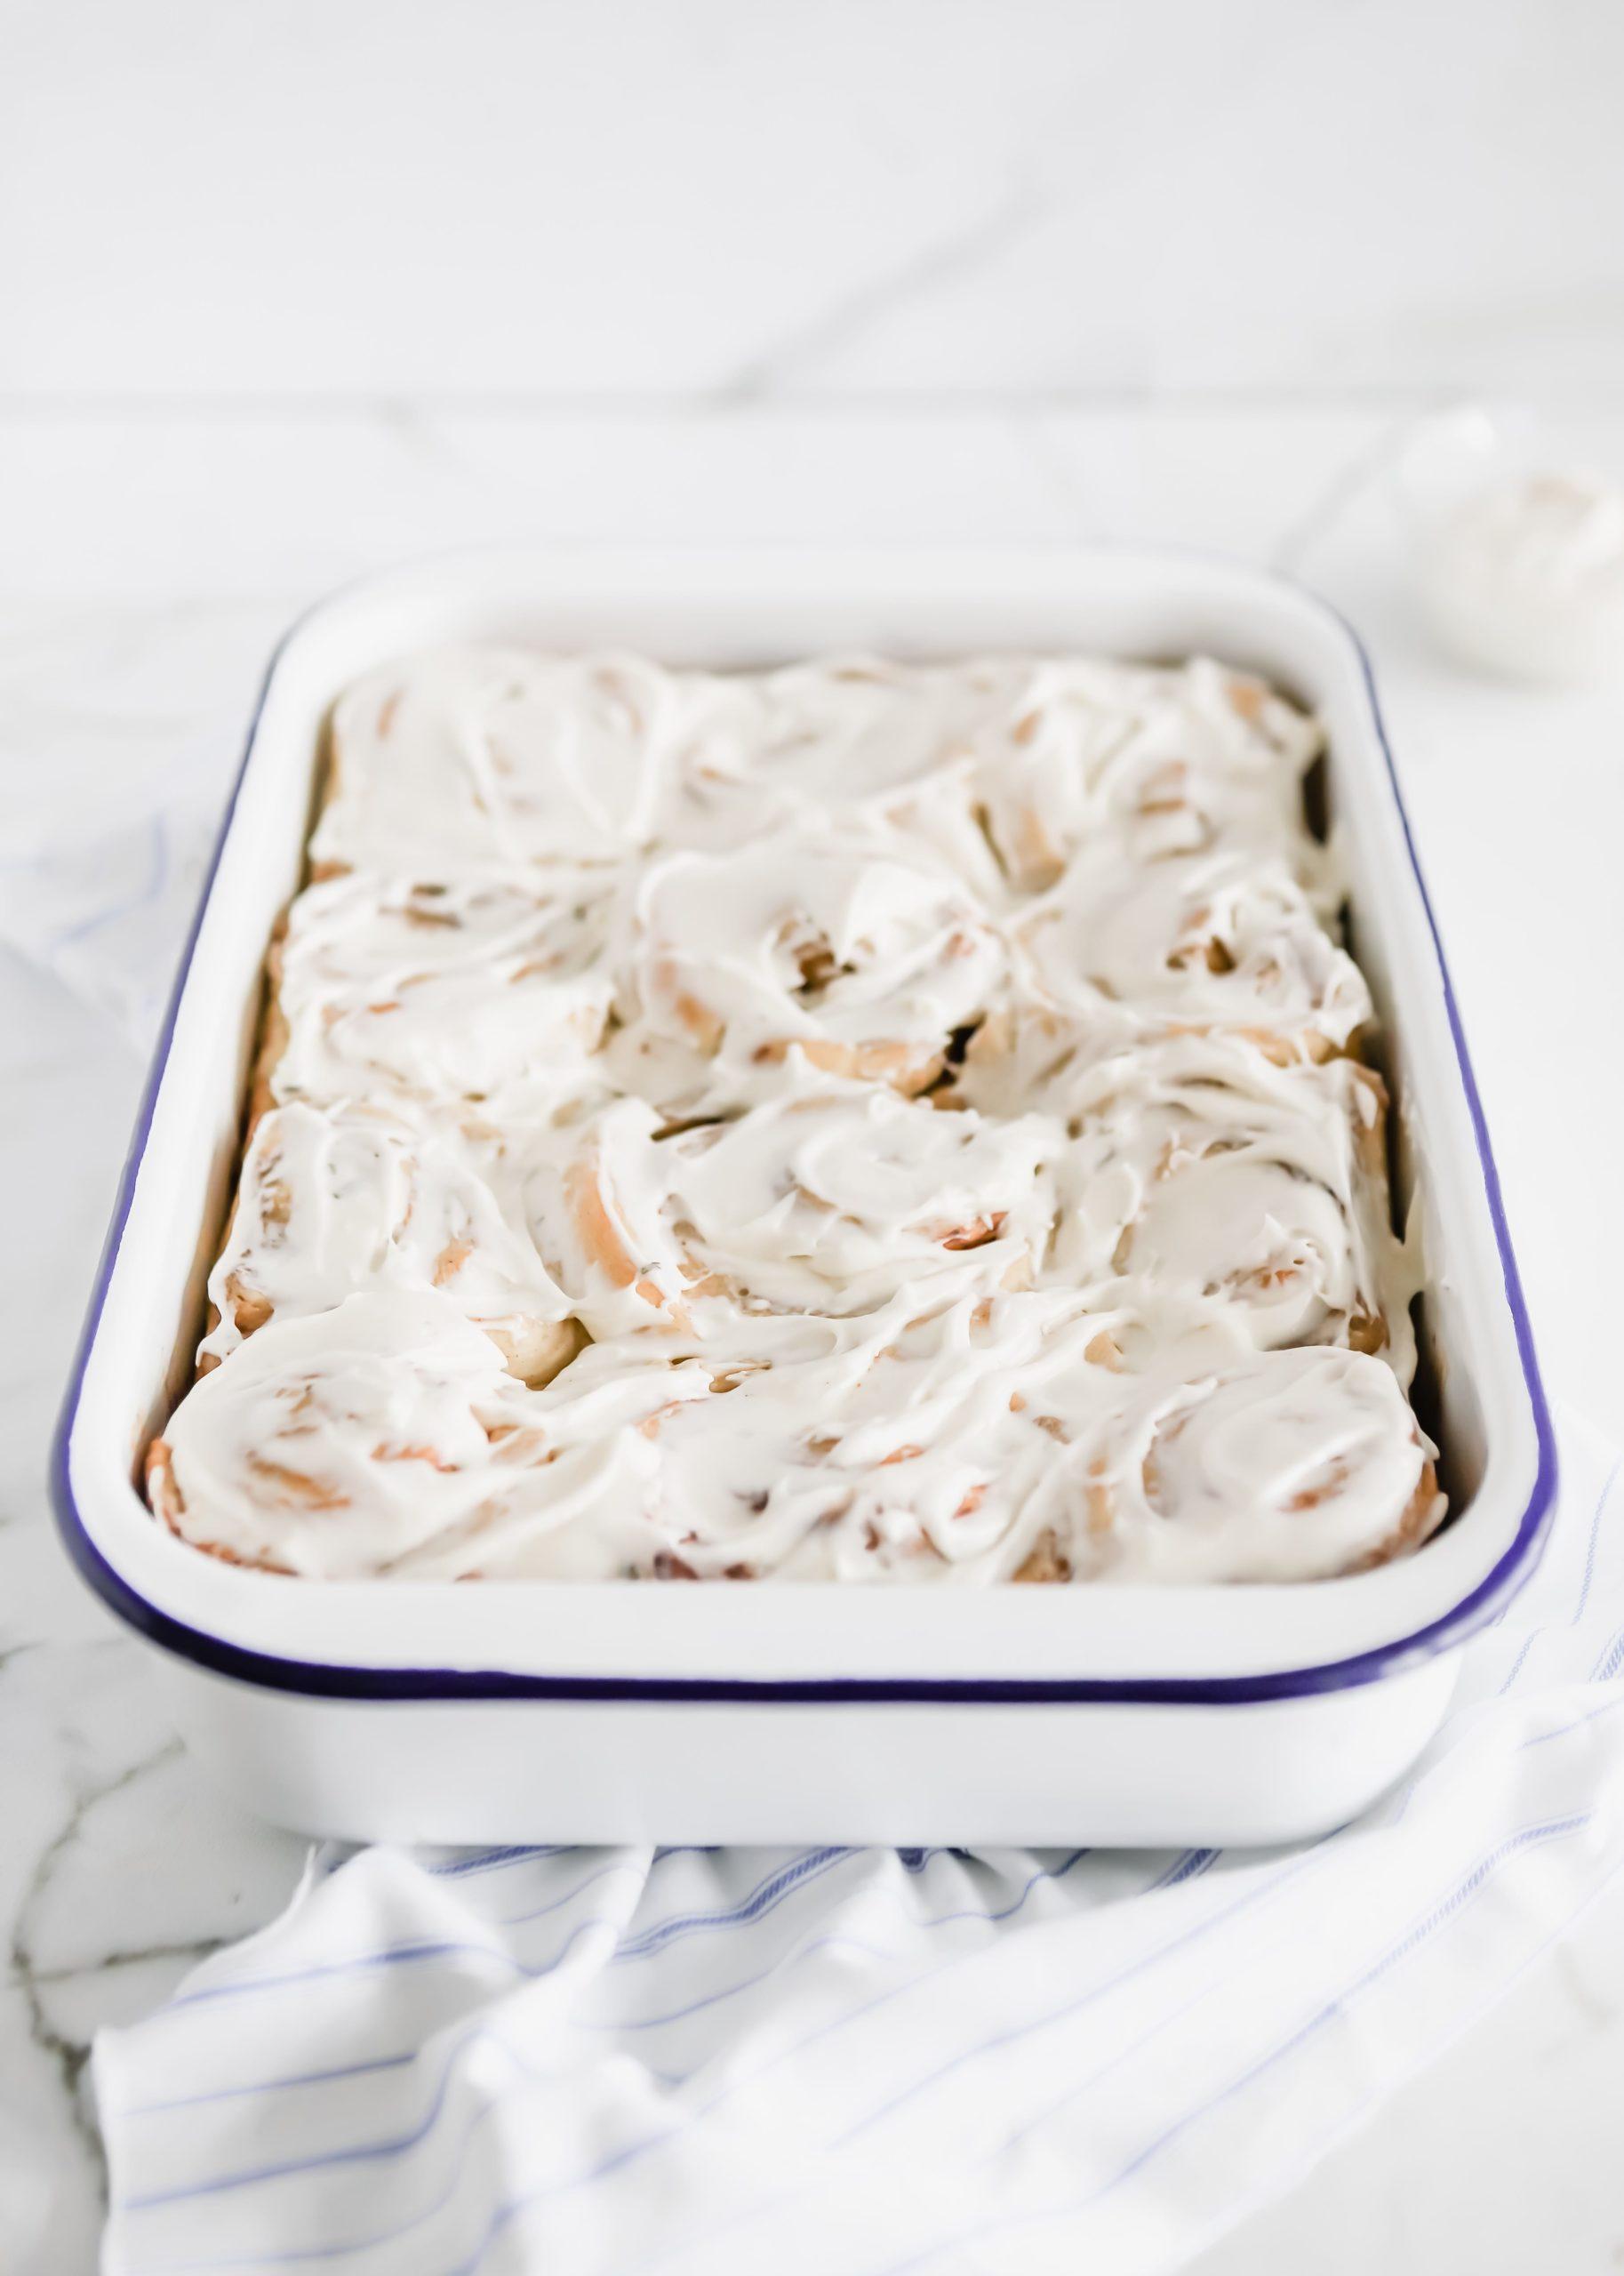 The Very Best Cinnamon Bun Recipe